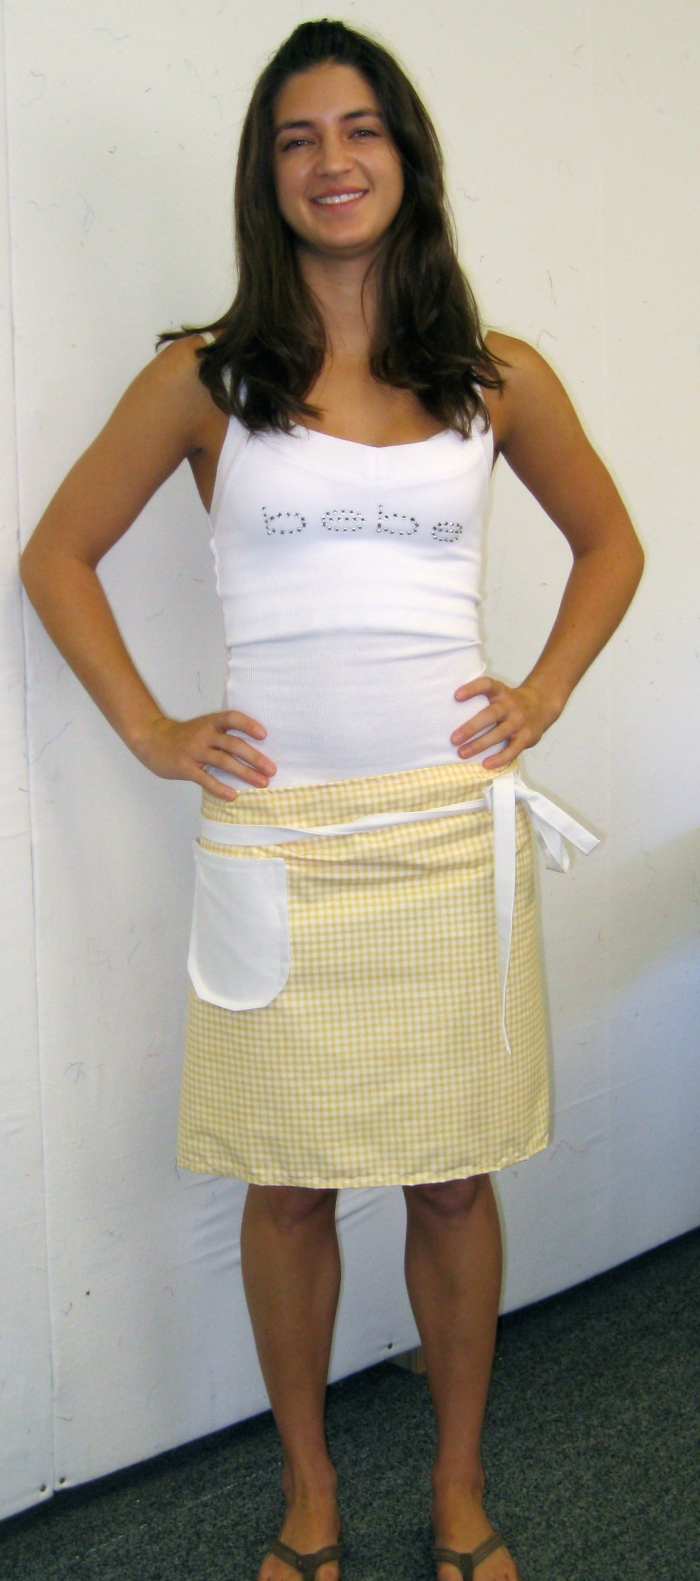 Alaina's attractive apron